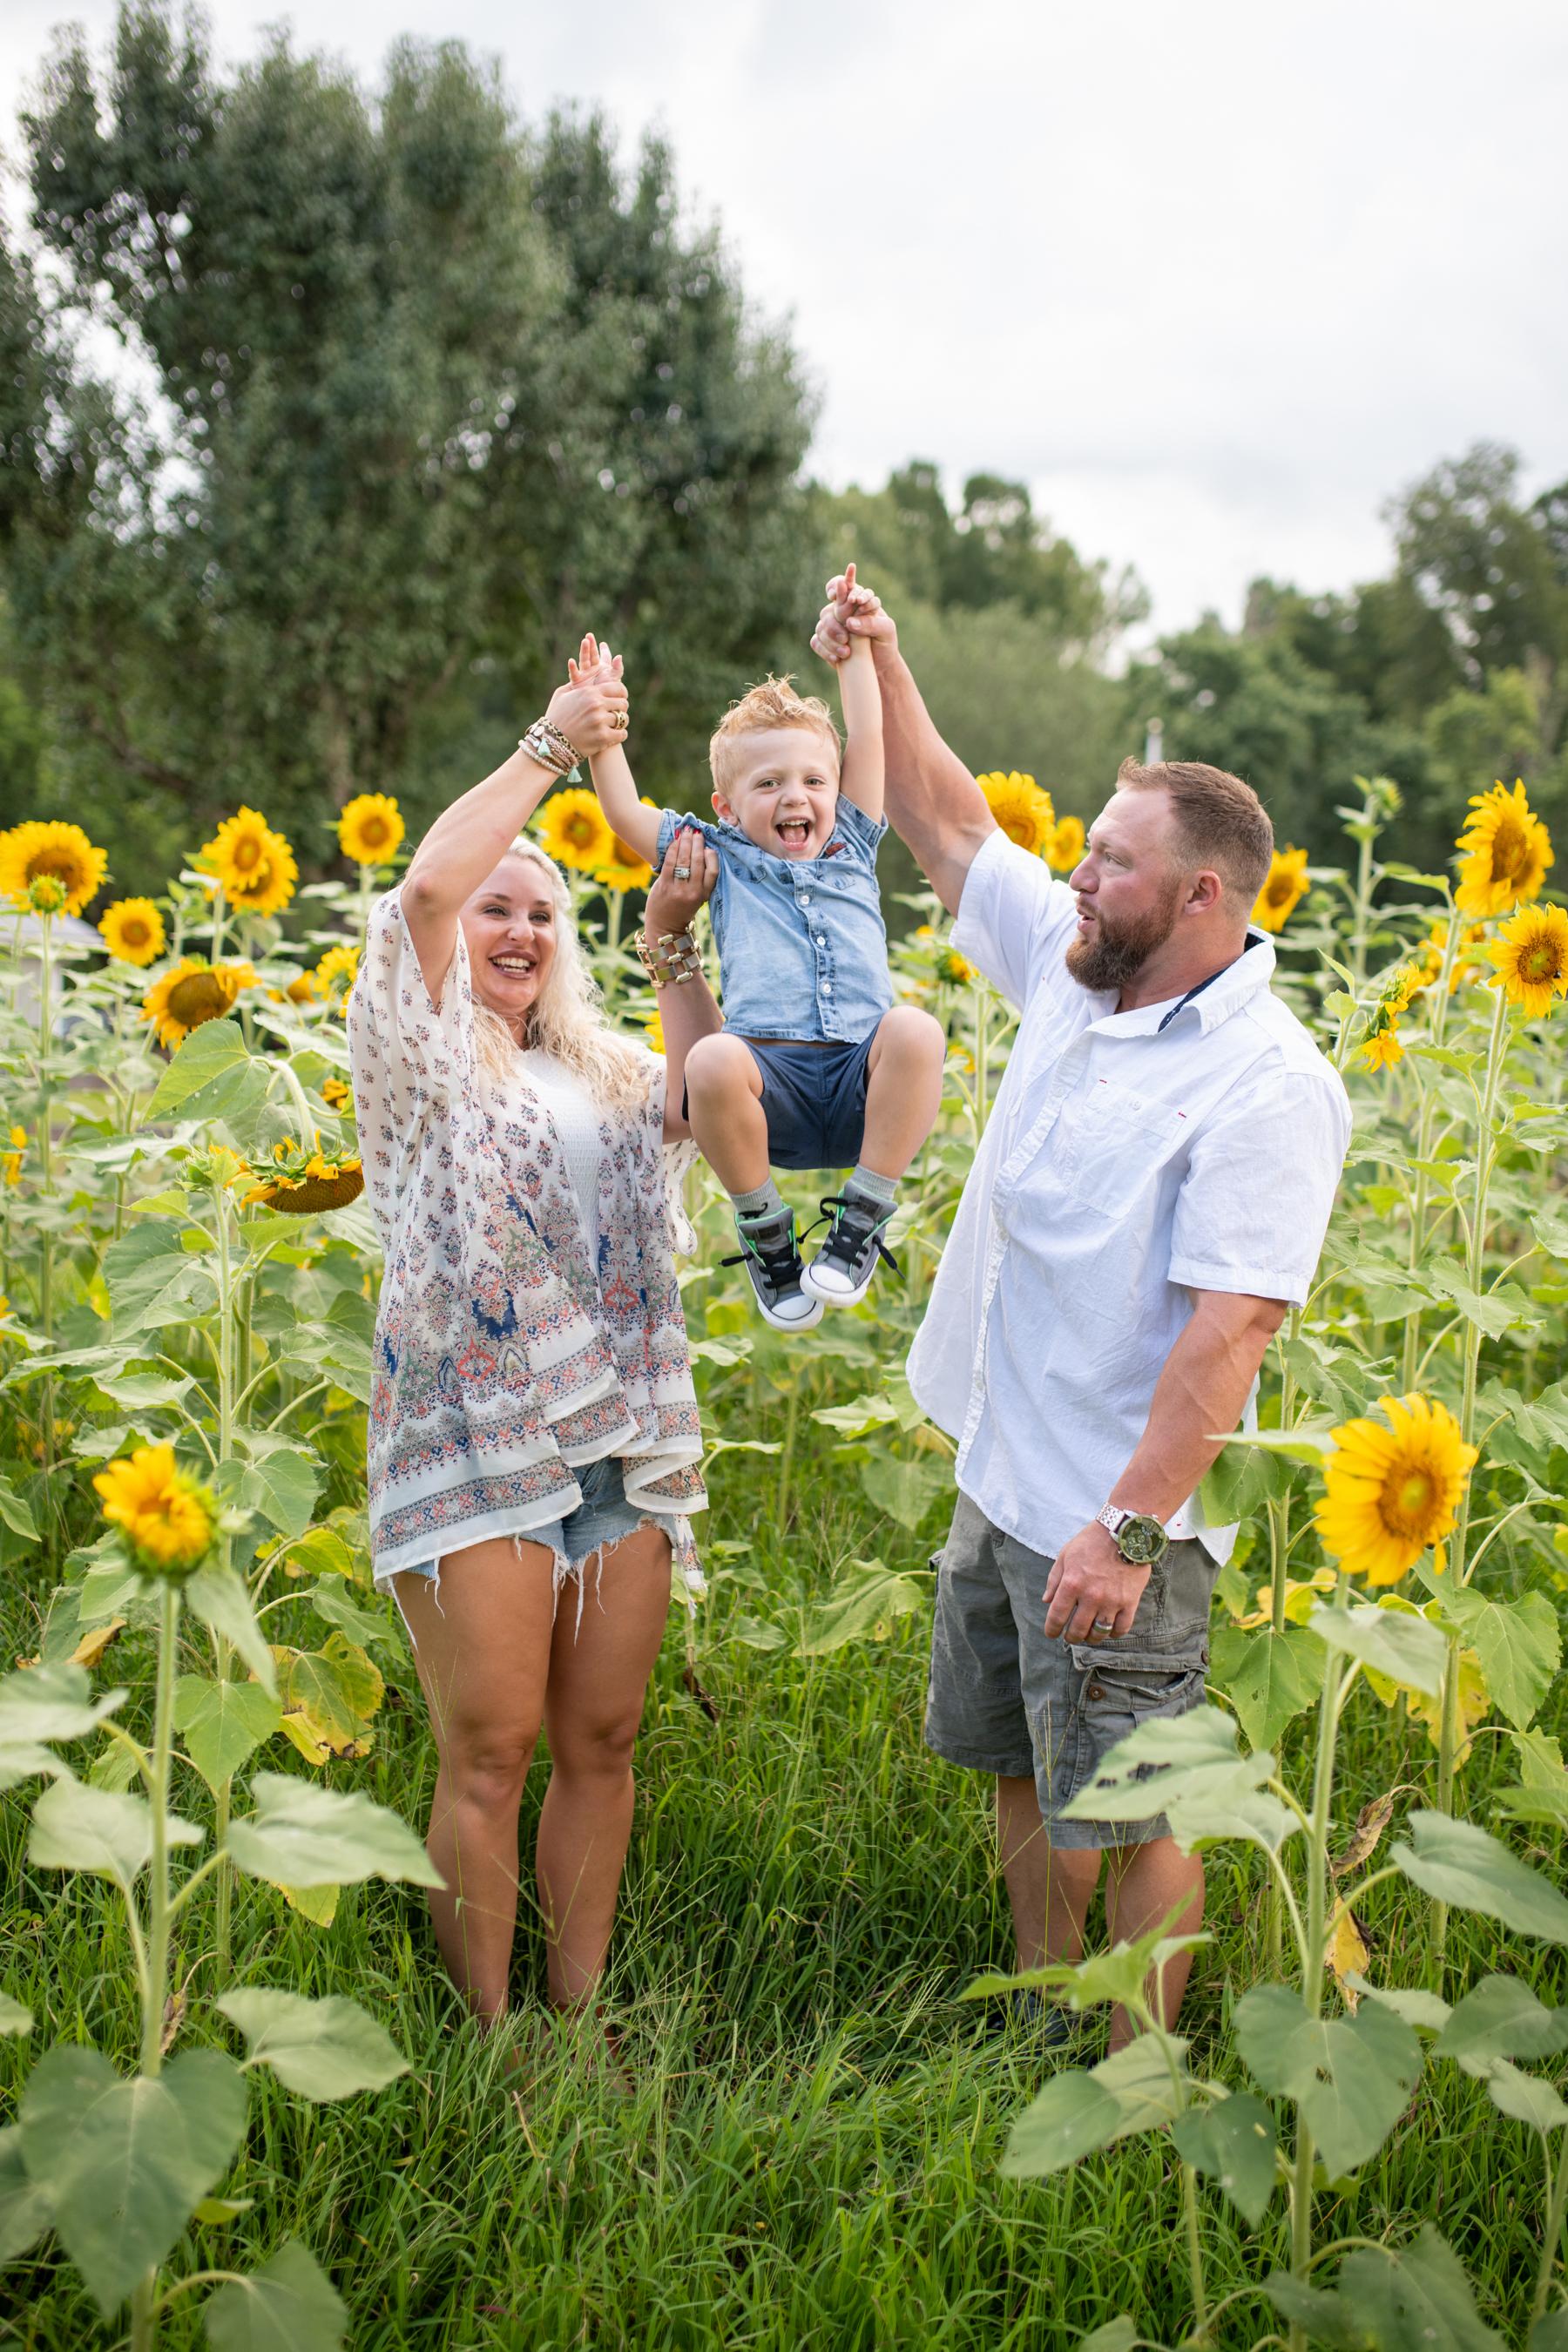 Sunflowers-Favs-1.jpg